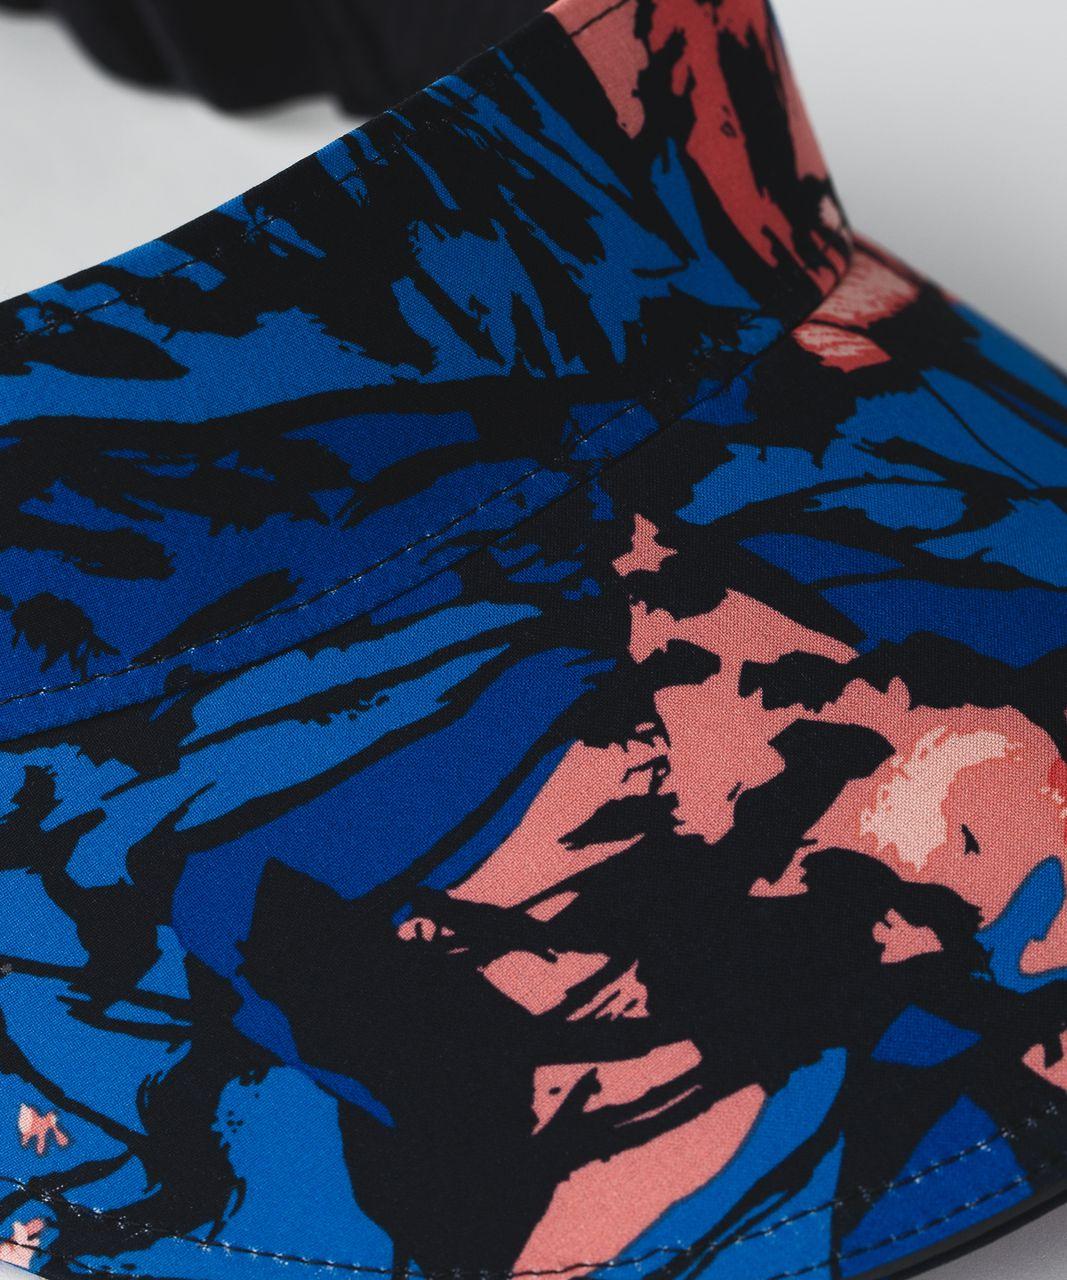 Lululemon Fast Paced Run Visor - Paint Storm Harbor Blue Multi / Black